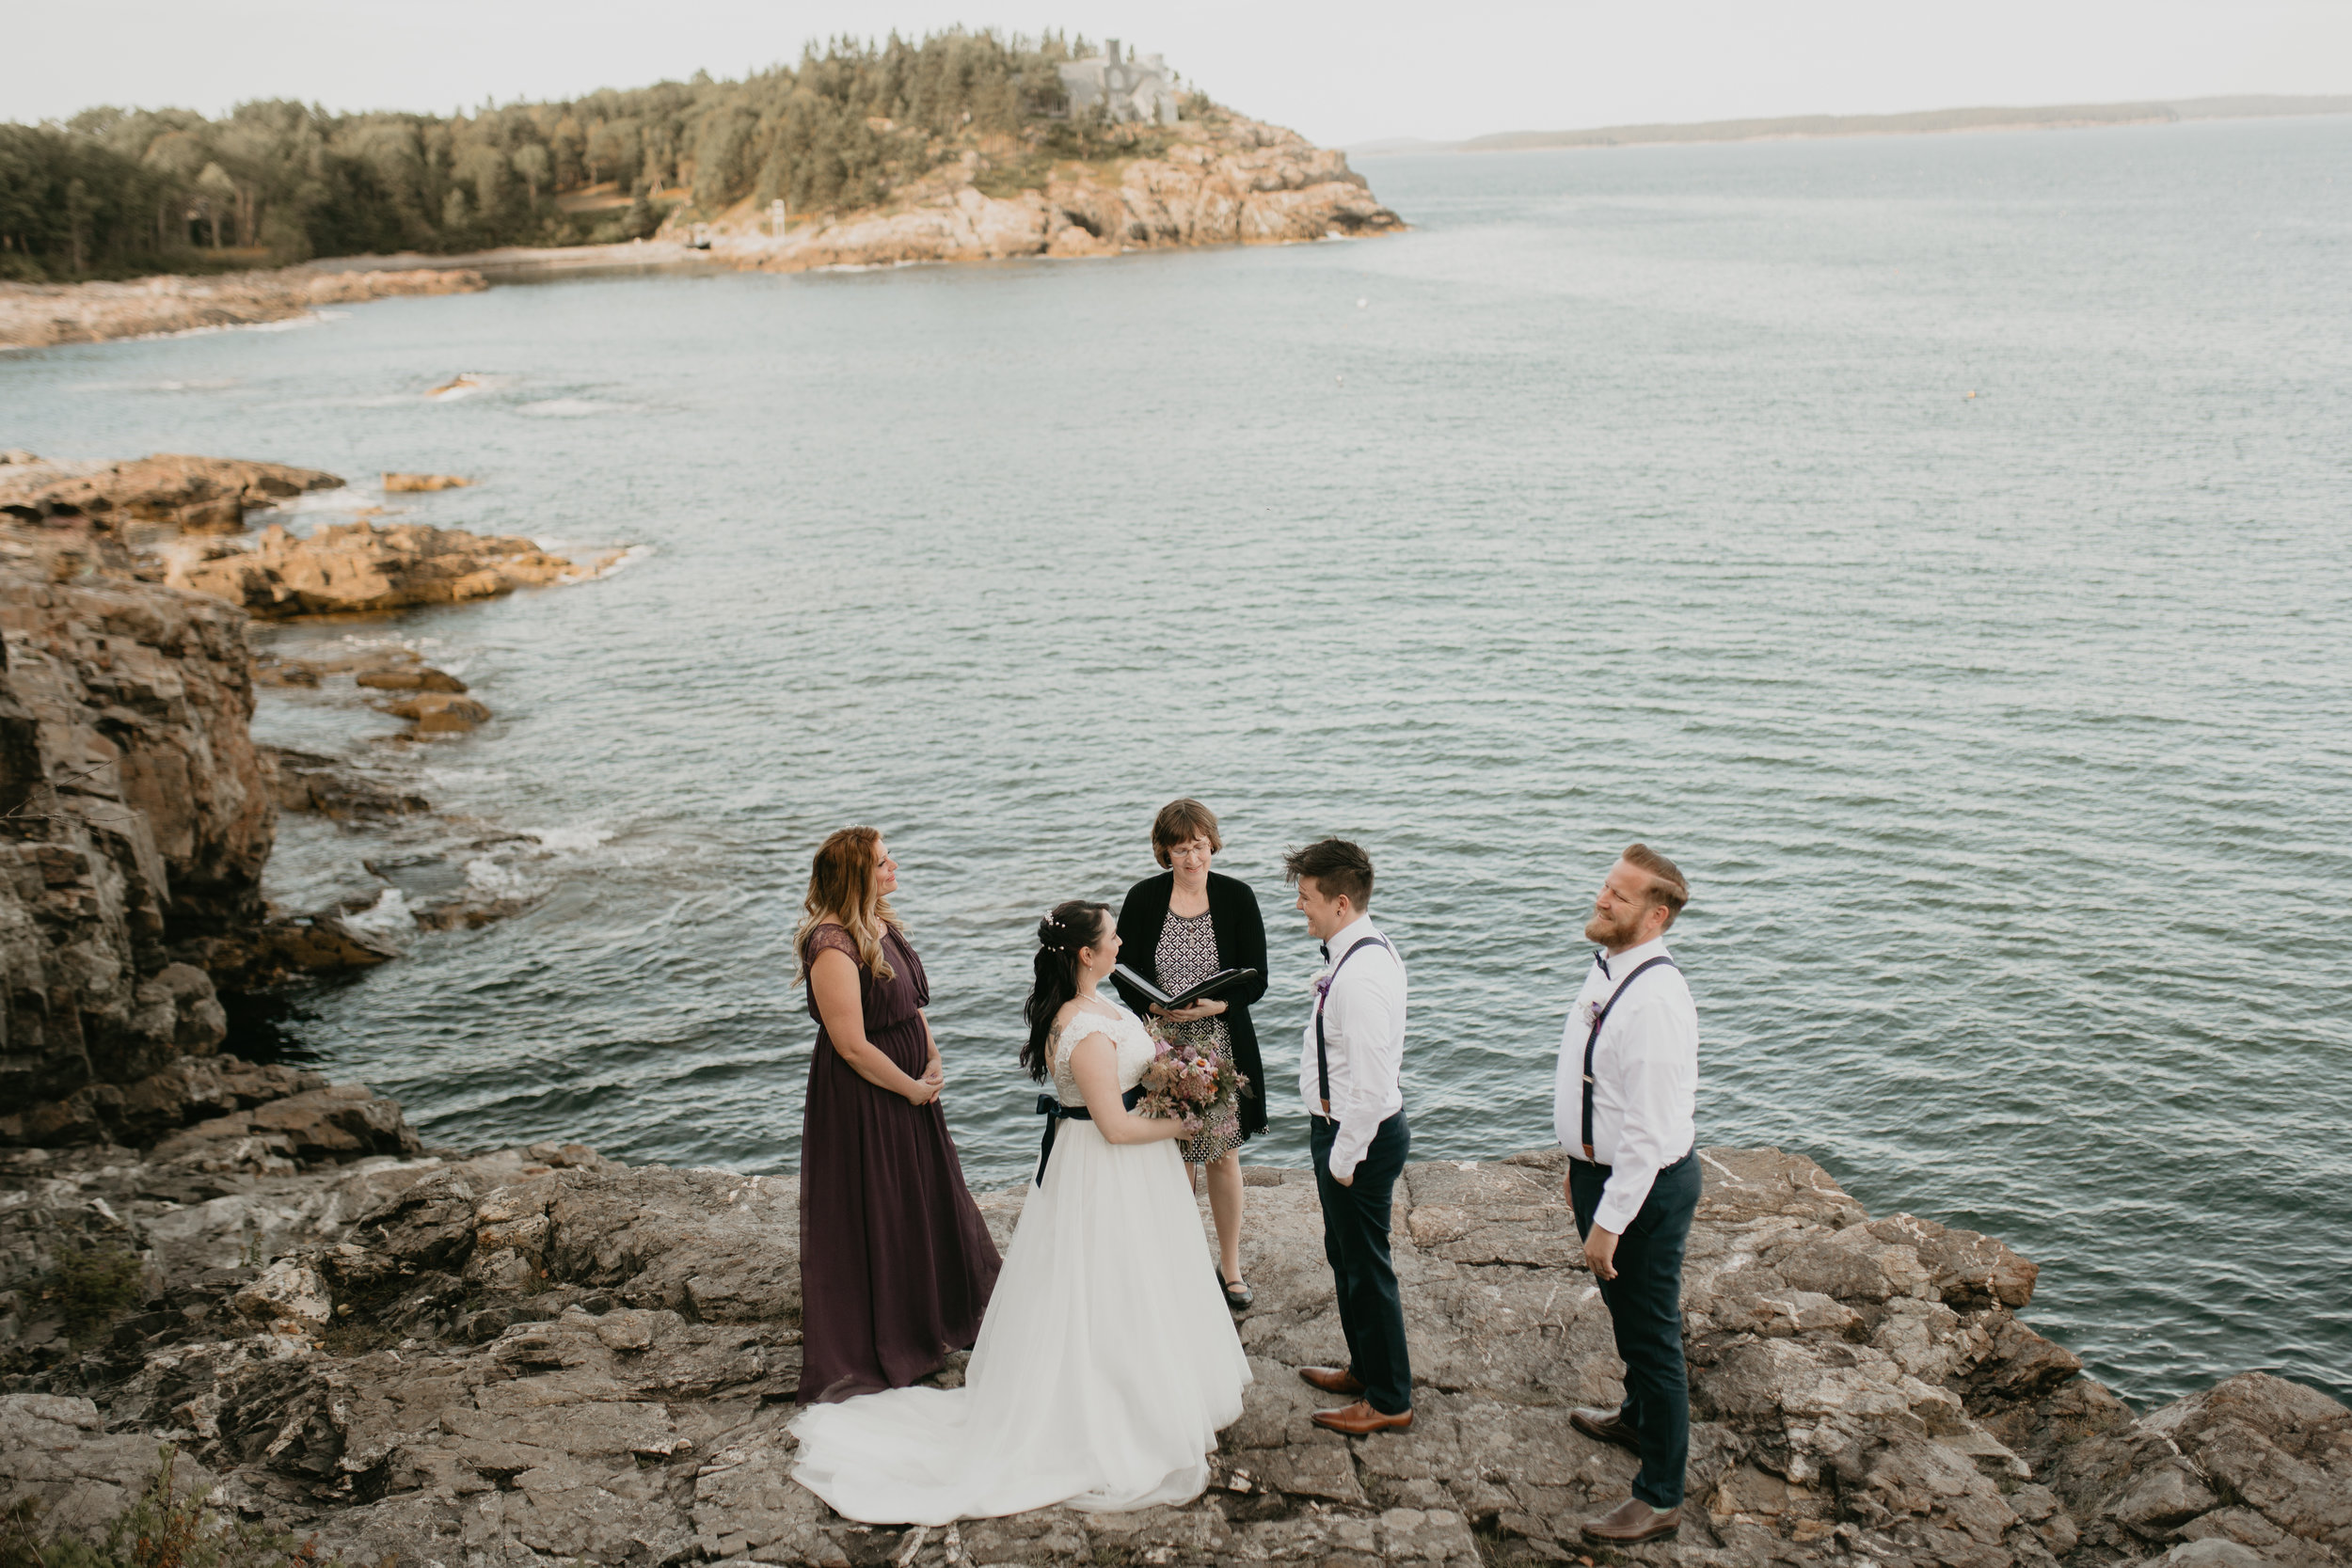 nicole-daacke-photography-Elopement-rocky-shoreline-coast-Acadia-National-Park-elopement-photographer-inspiration-maine-elopement-otter-cliffs-schoonic-head-point-14.jpg